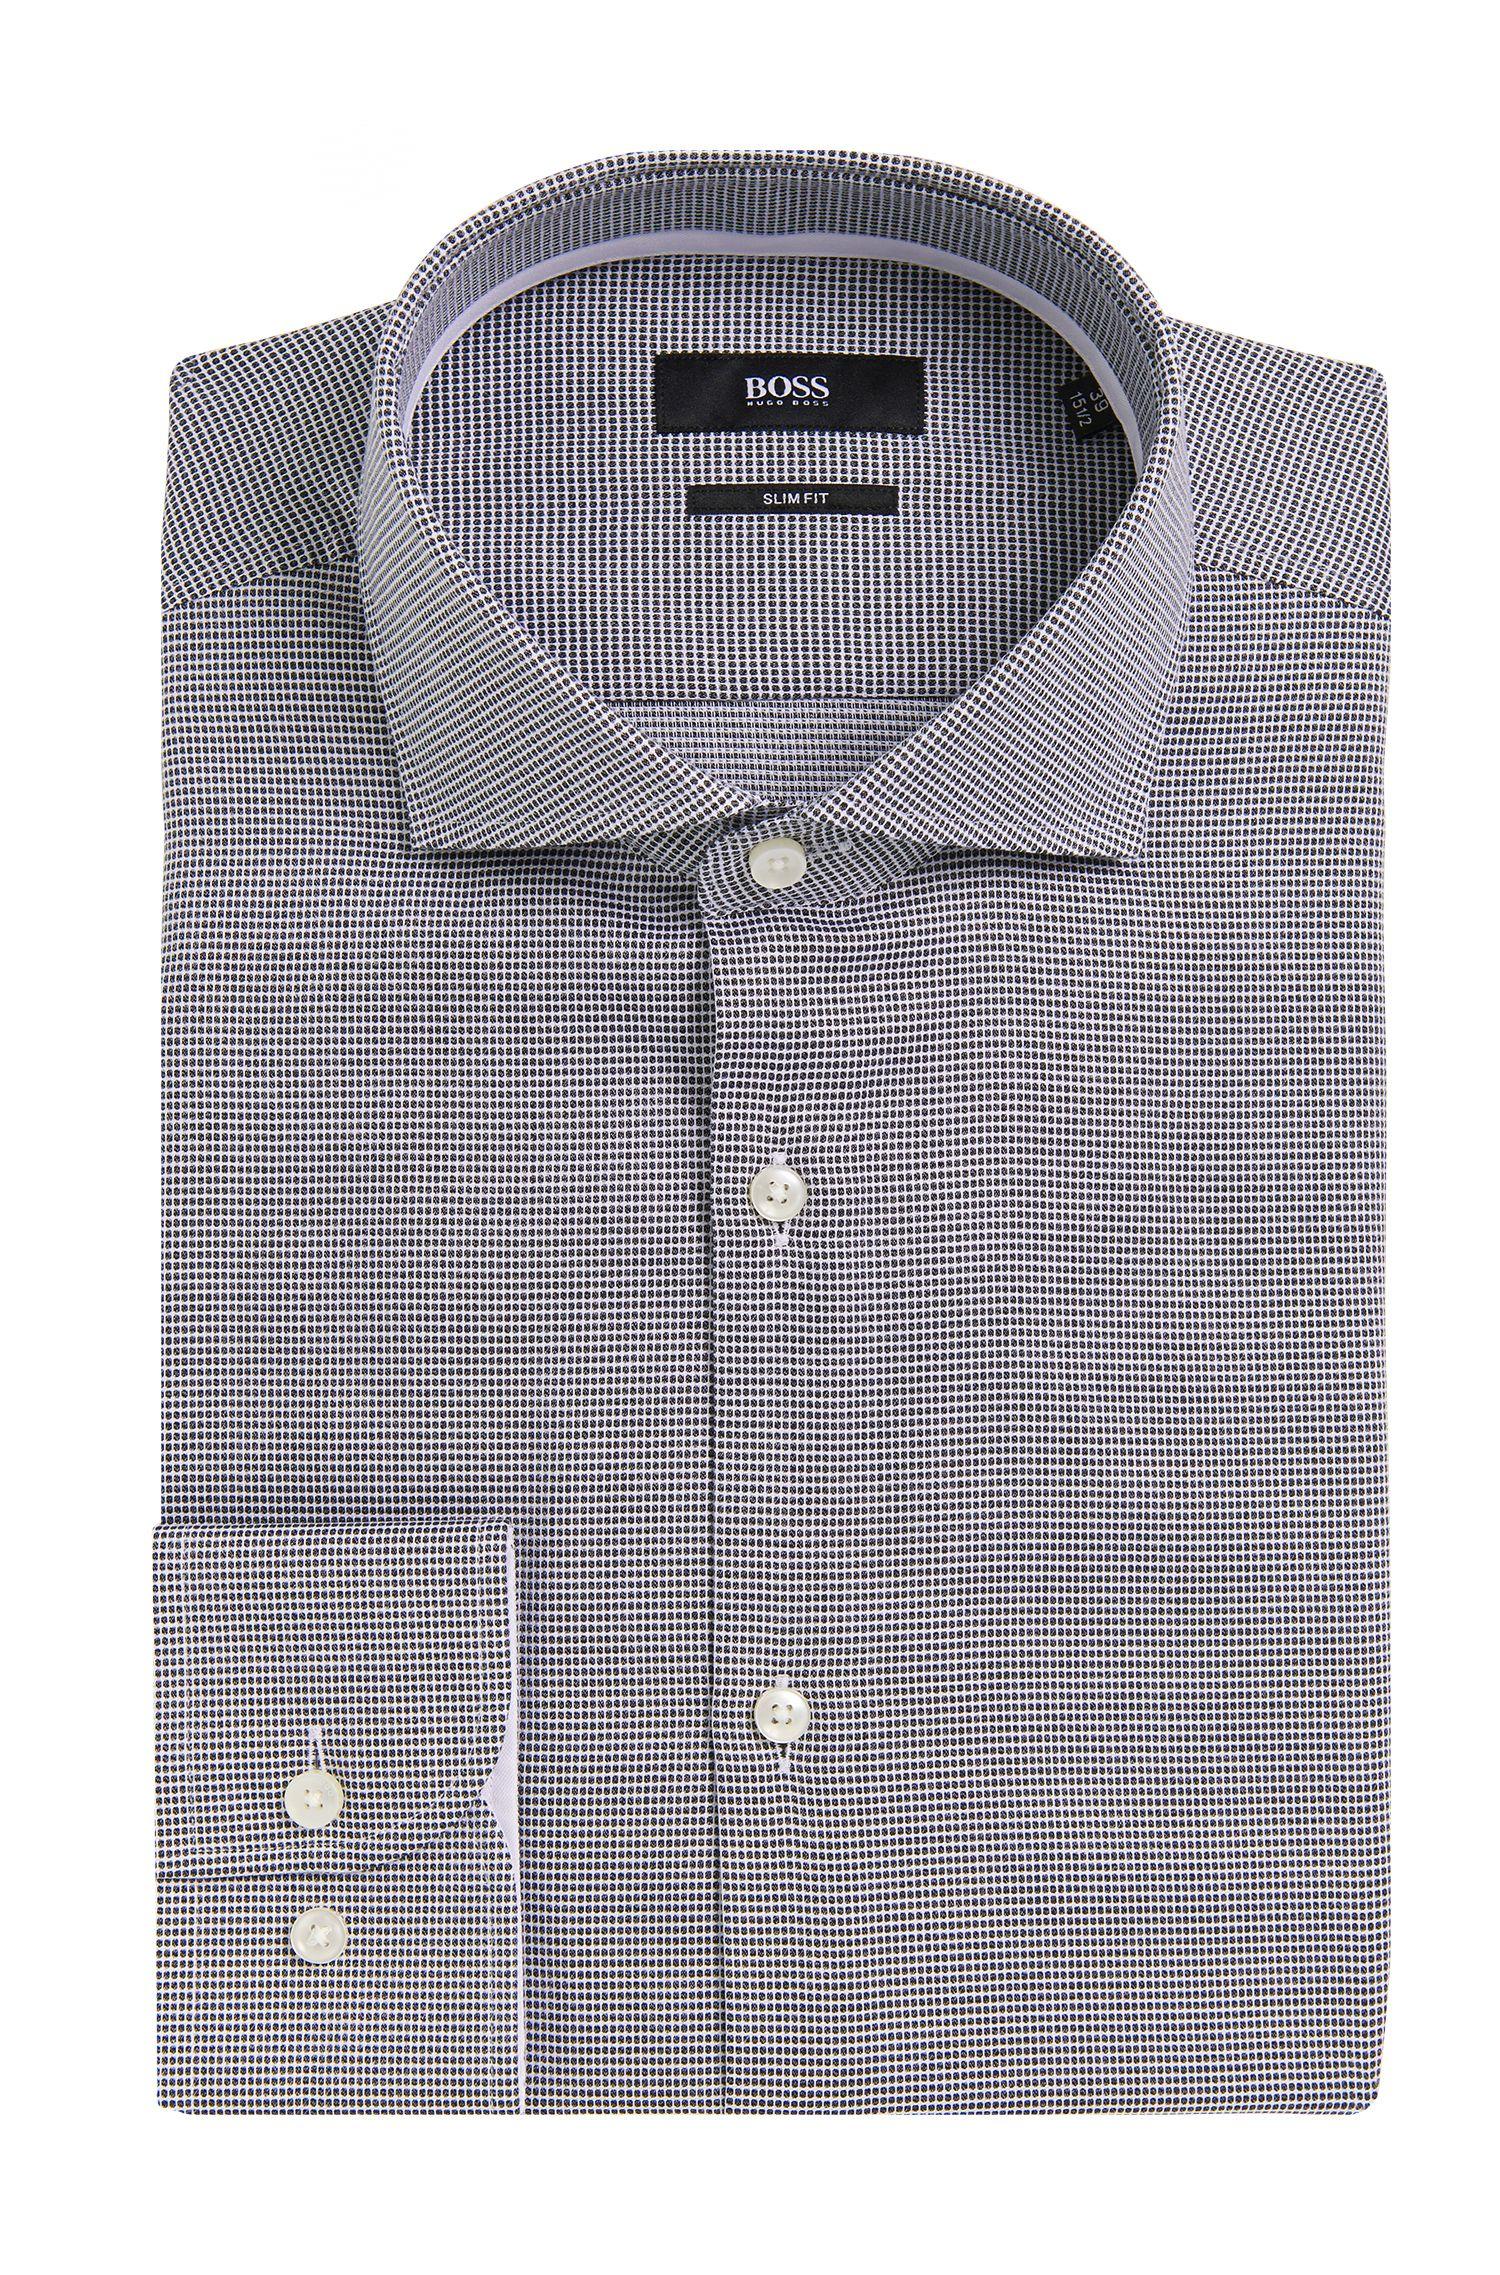 'Jery' | Slim Fit, Cotton Dress Dobby Shirt